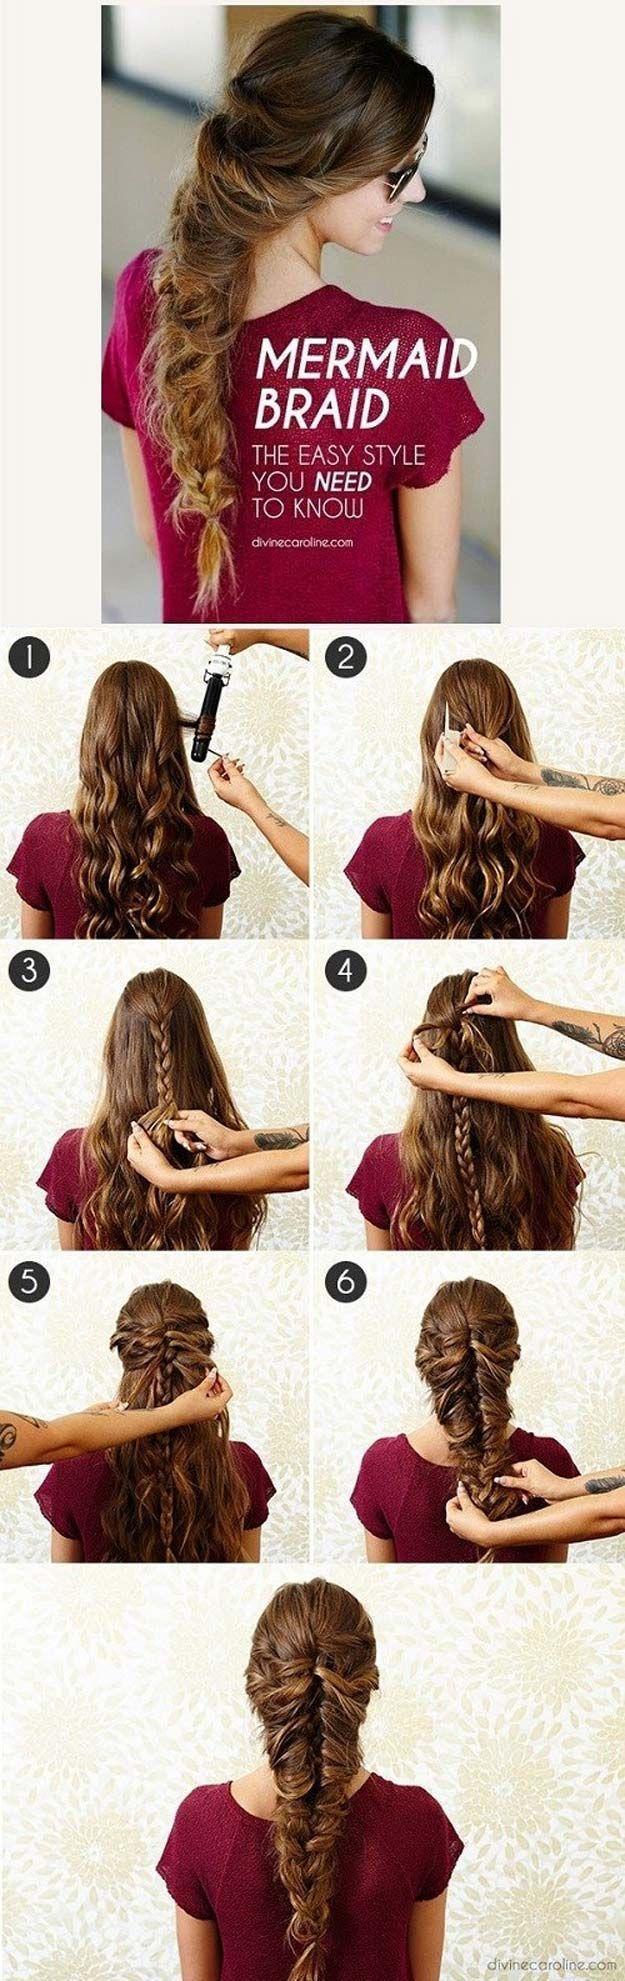 Best Hair Braiding Tutorials - Mermaid Braid - Easy Step by Step Tutorials for Braids - How To Braid Fishtail, French Braids, Flower Crown, Side Braids, Cornrows, Updos - Cool Braided Hairstyles for Girls, Teens and Women - School, Day and Evening, Boho,